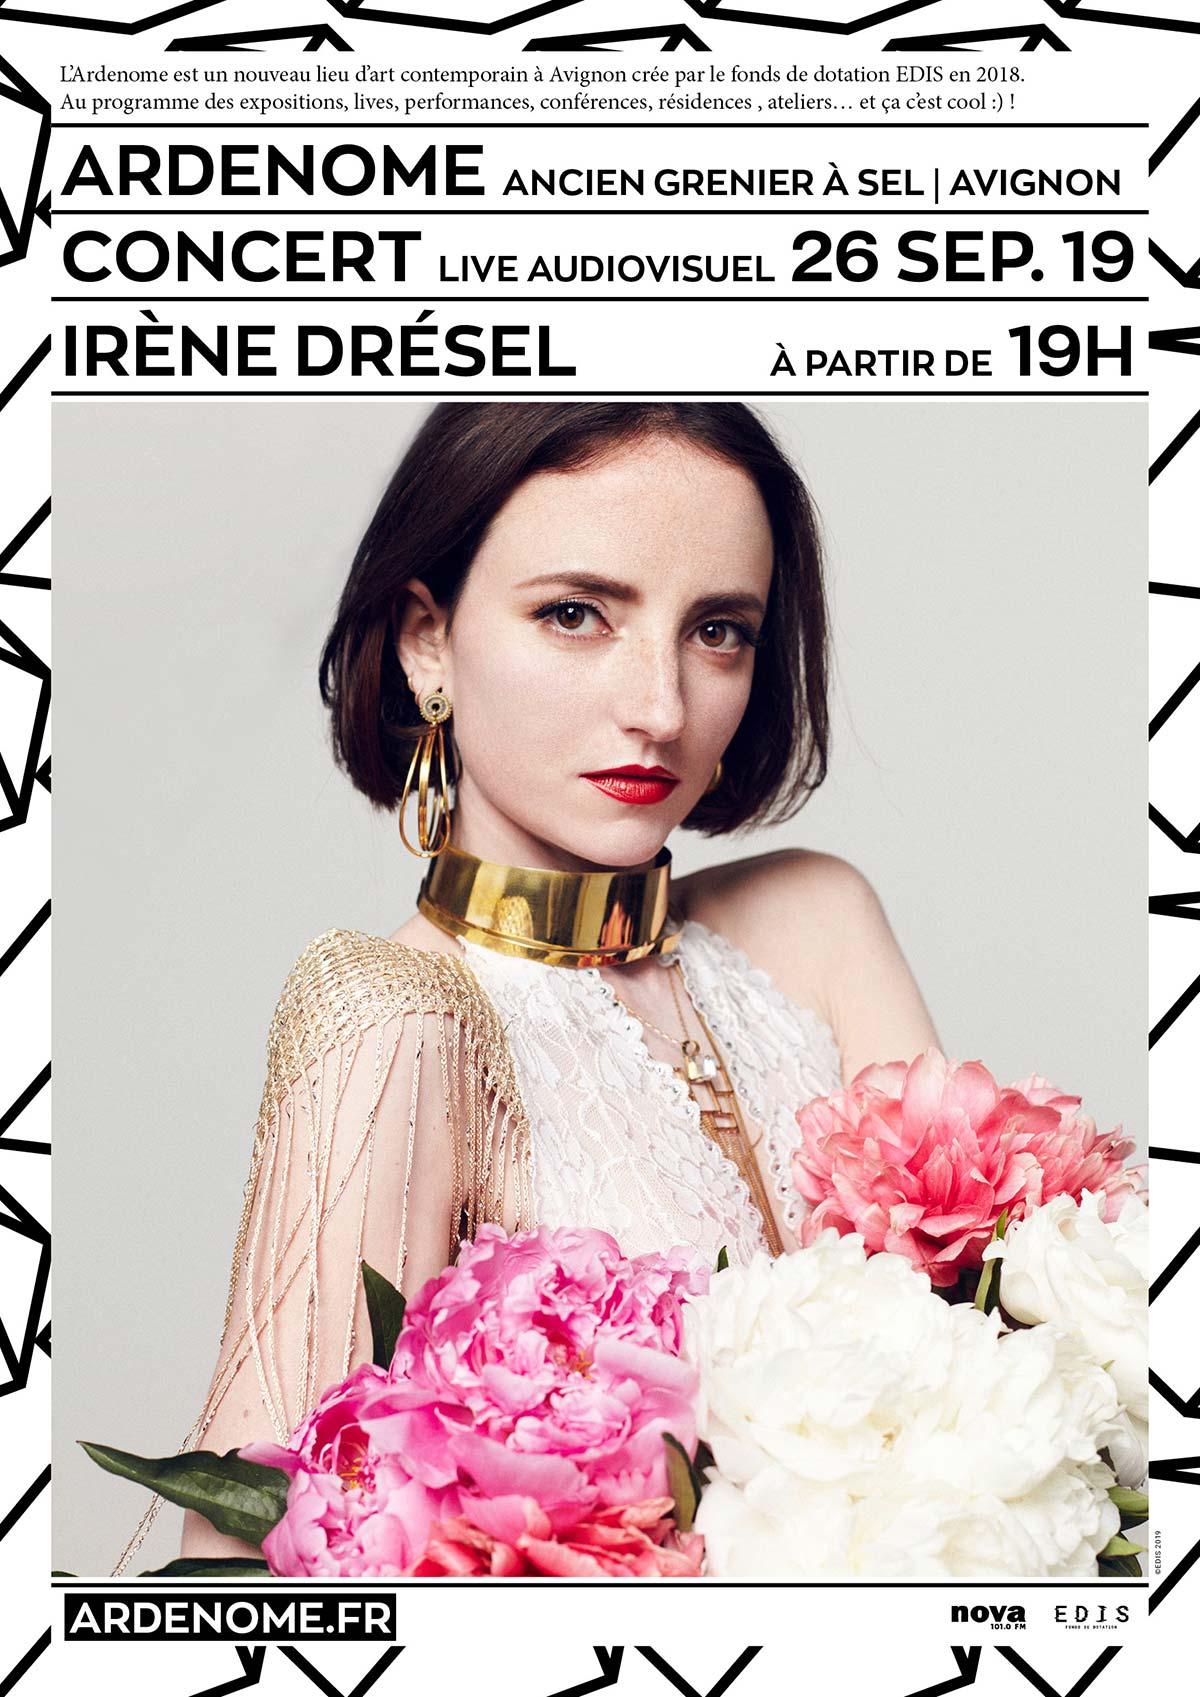 Portrait Irene Dresel